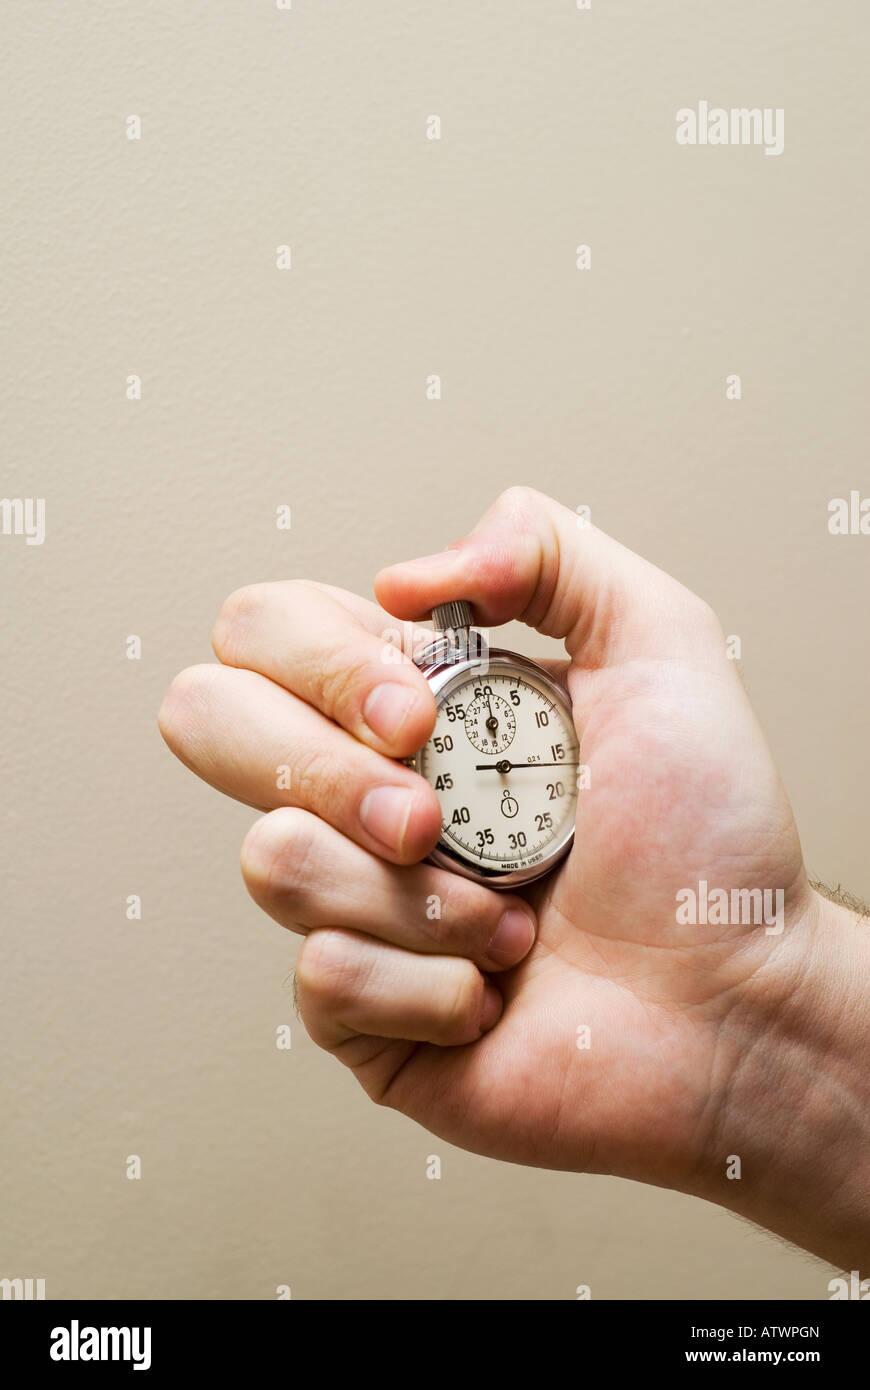 Hand holding stopwatch chronometer - Stock Image